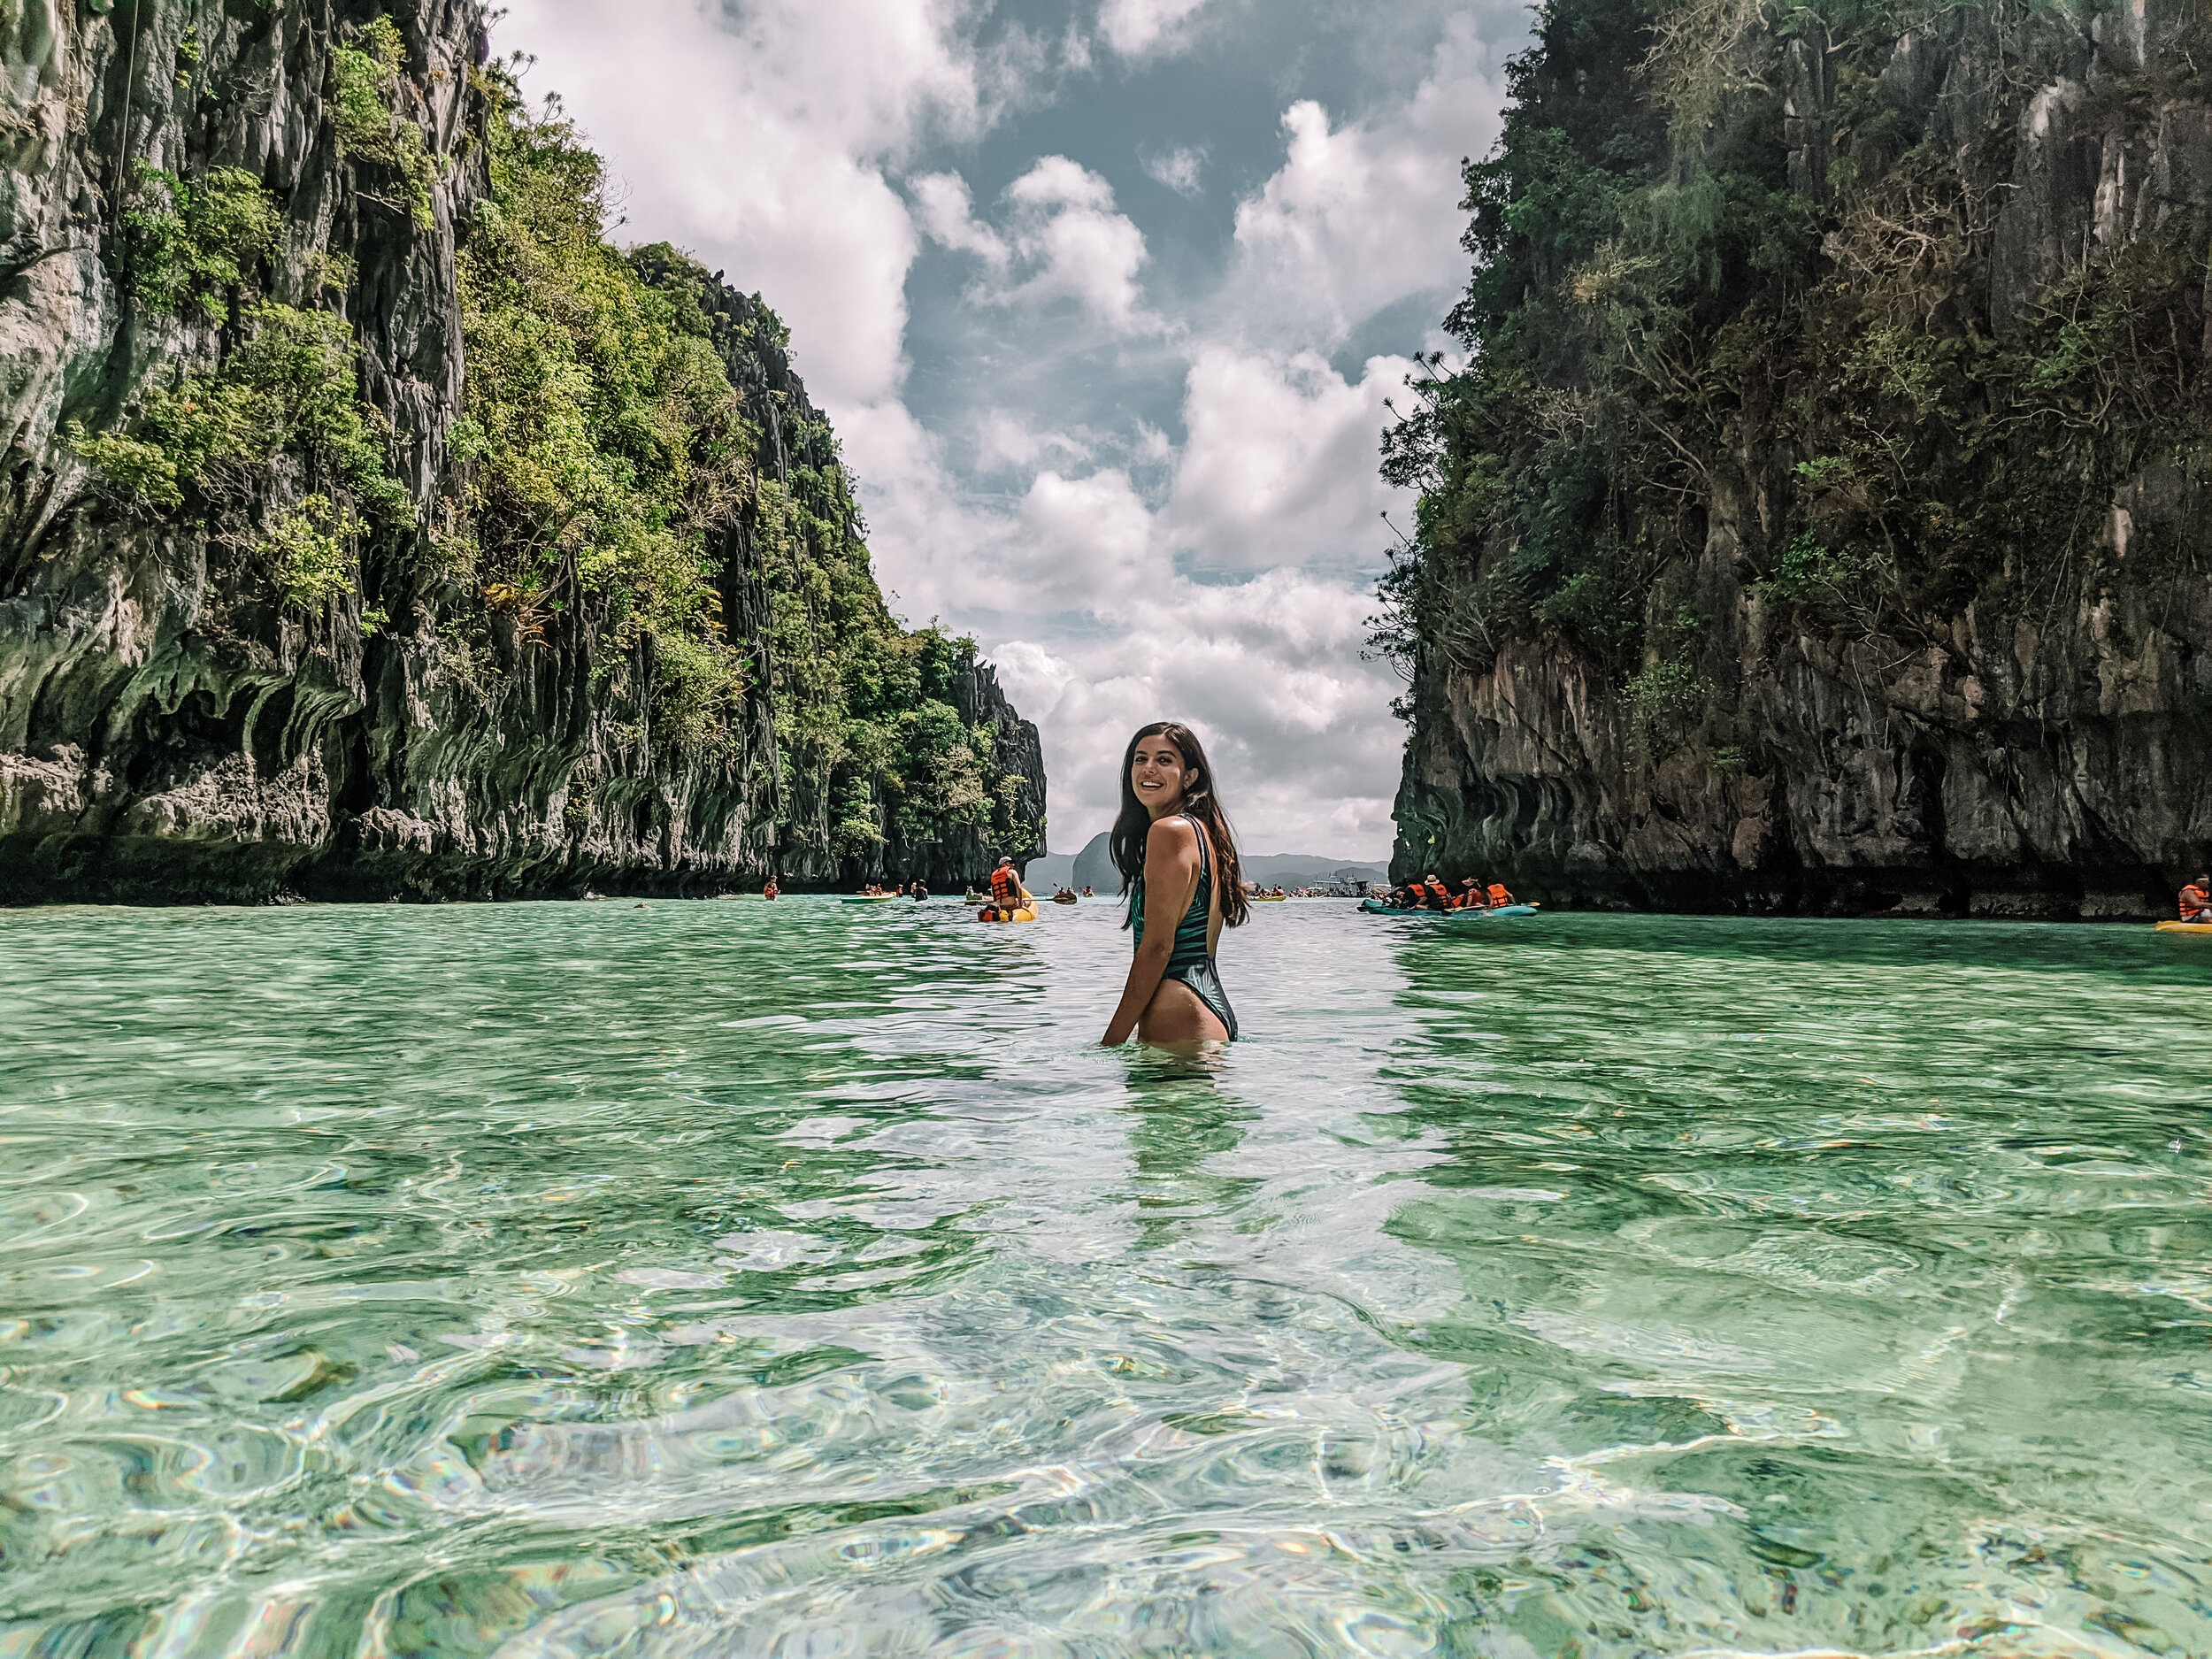 Rachel Off Duty: Woman in El Nido Lagoons, Philippines